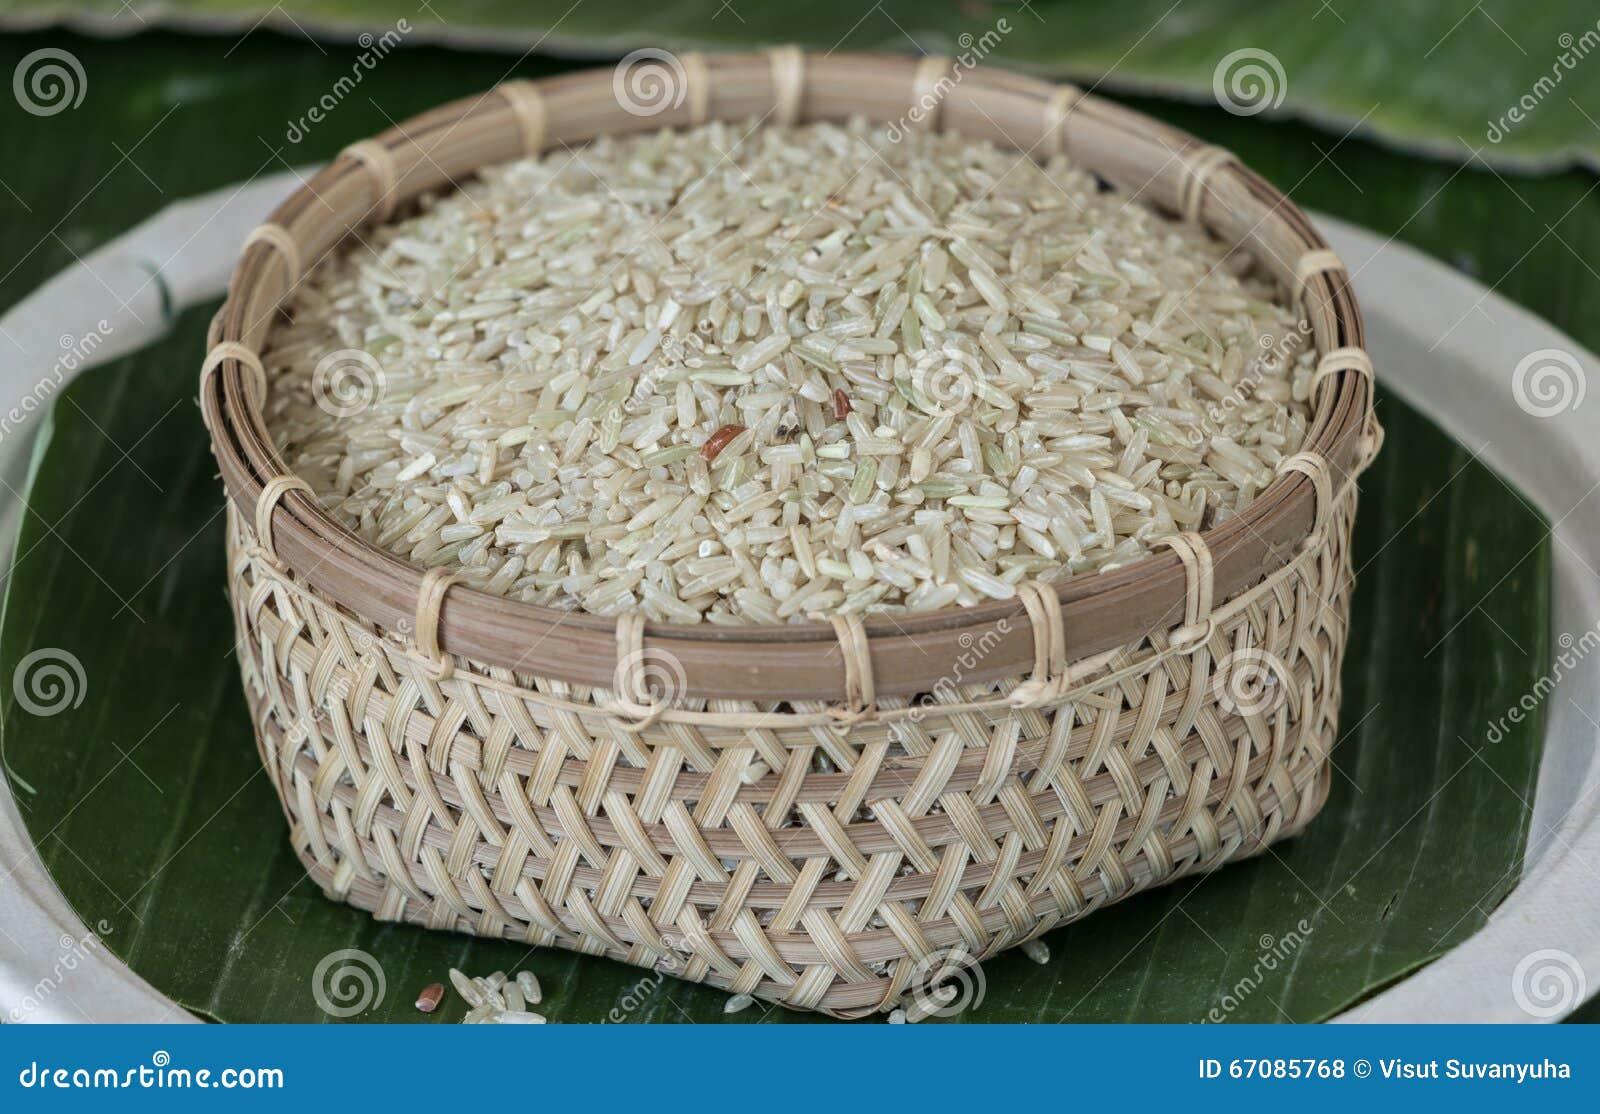 In Thailand Like White Glutinous Rice. Stock Photo - Image ...